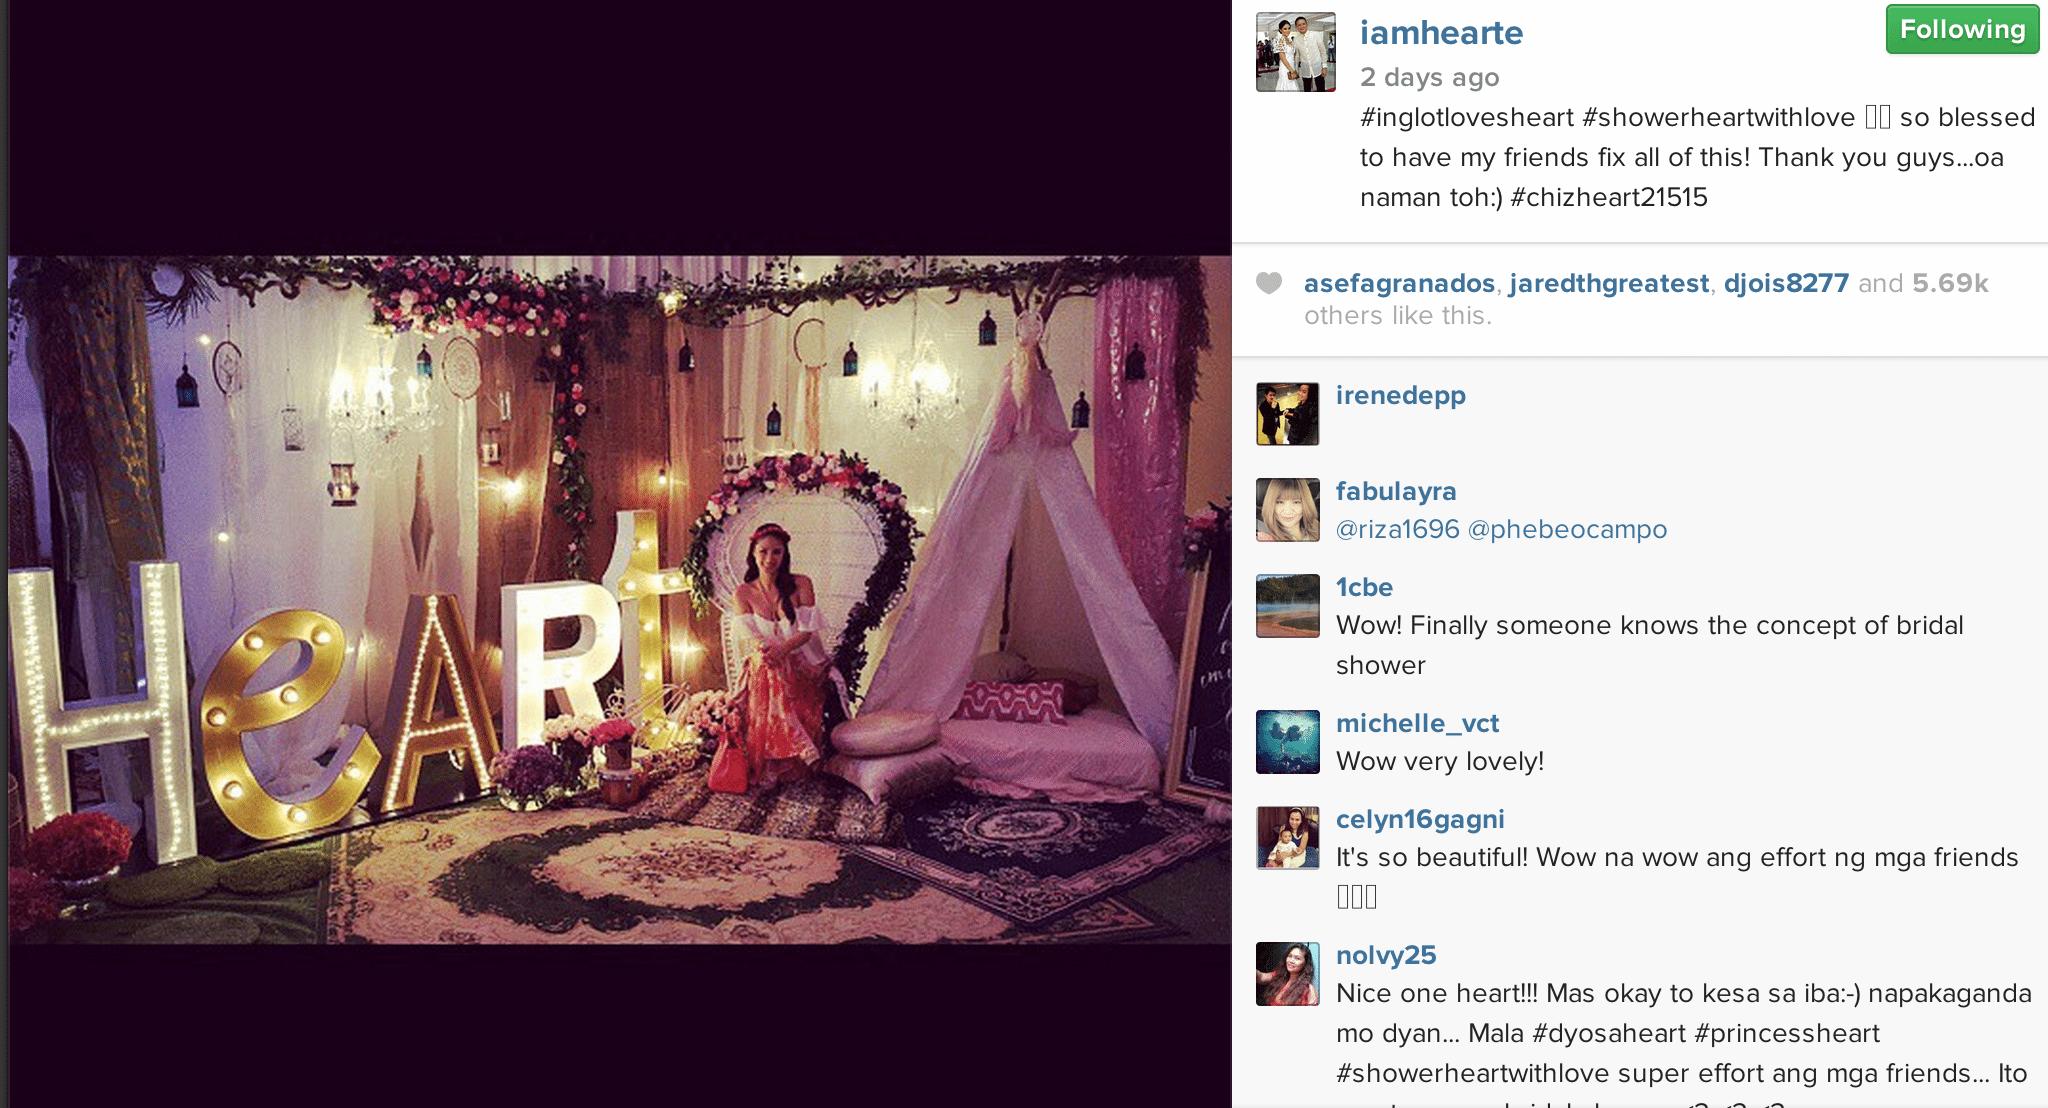 From @iamhearte's Instagram